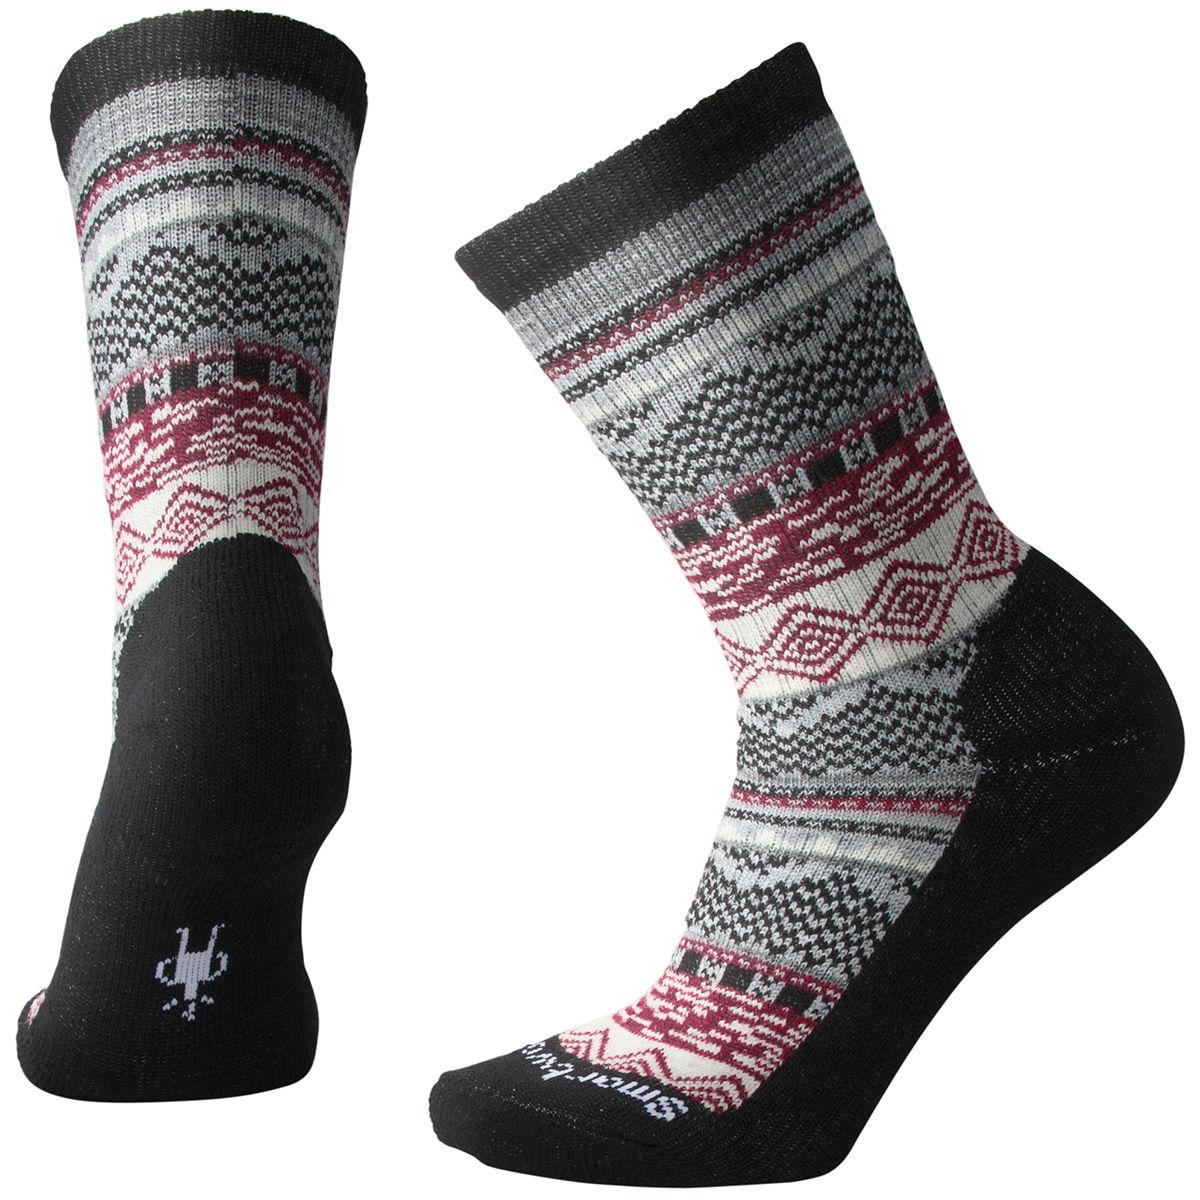 Smartwool Women's Dazzling Wonderland Crew Socks - Black, L